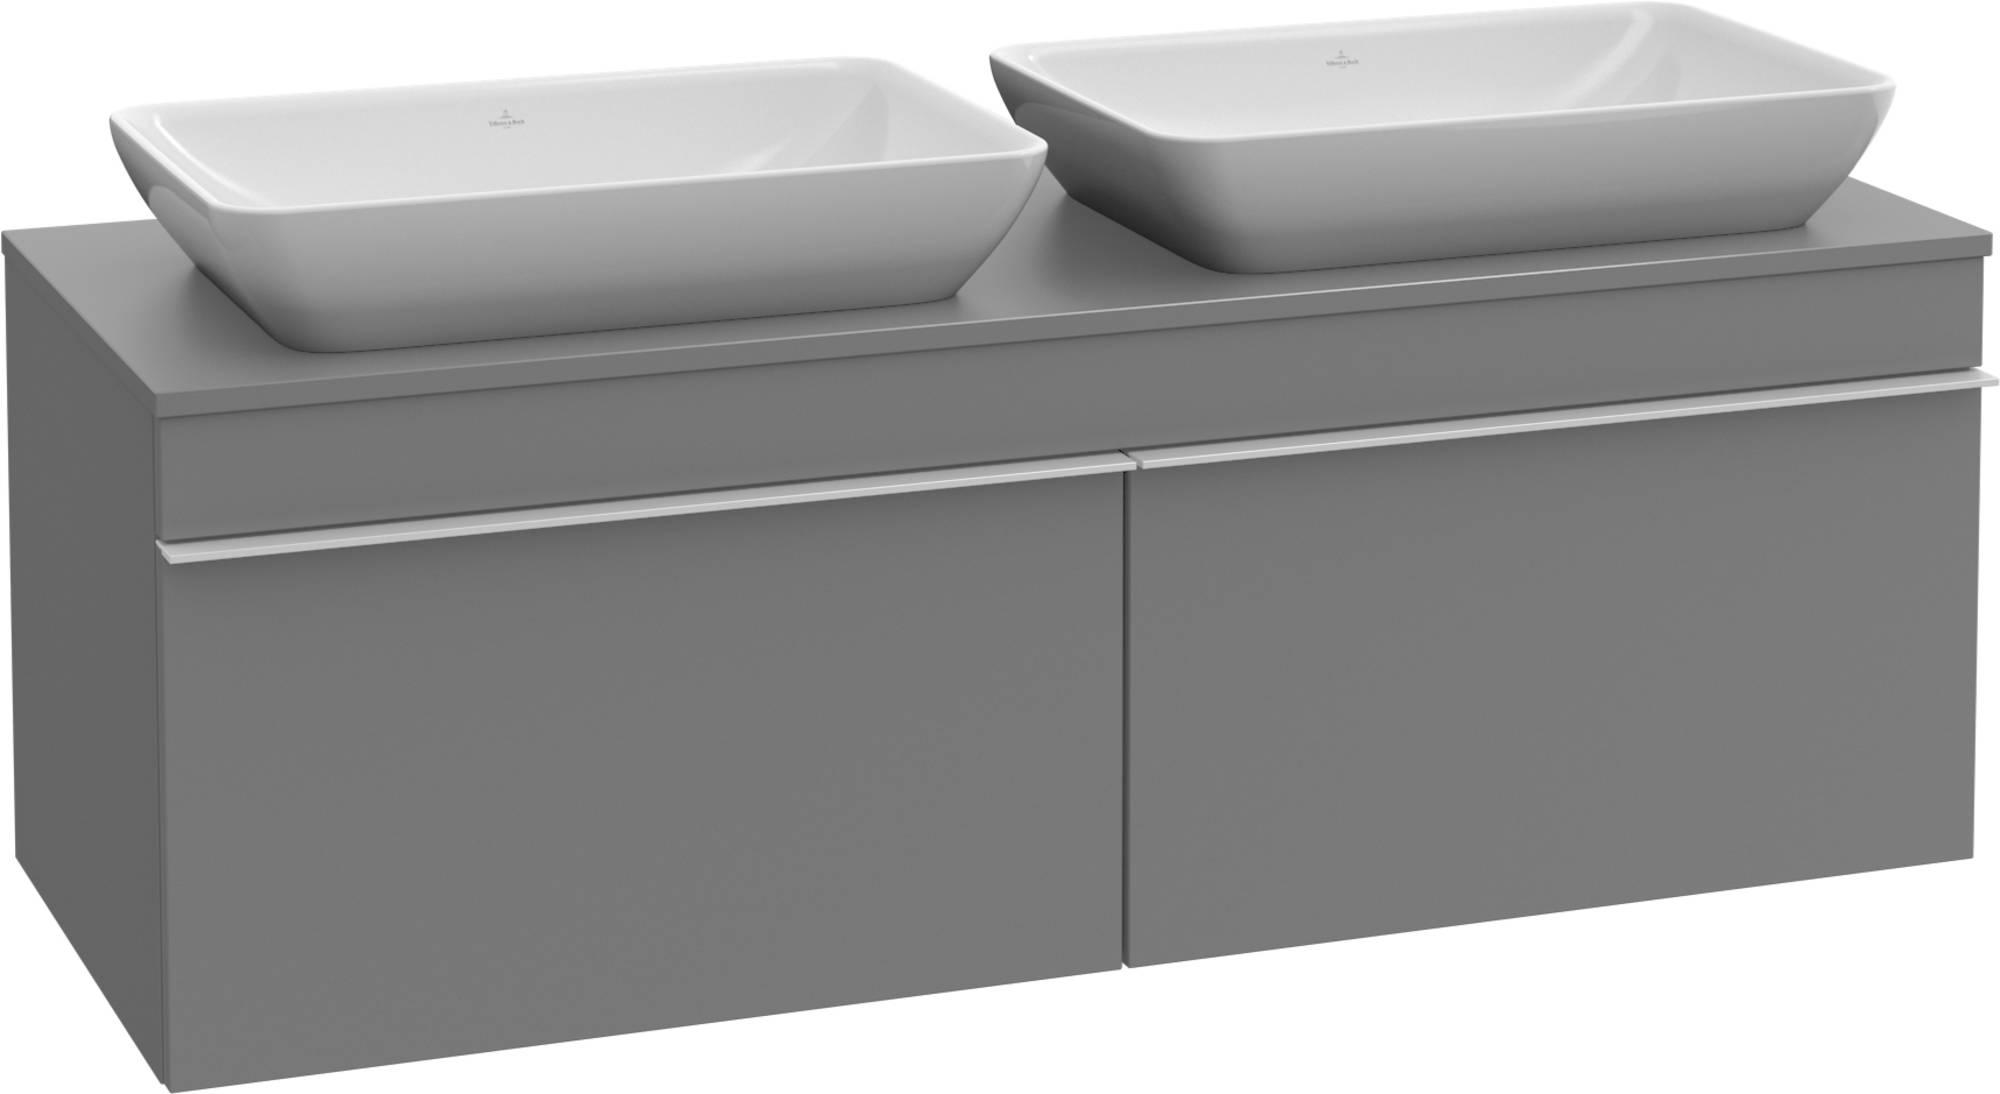 Villeroy&Boch Venticello Wastafelonderkast 125,7x50,2x43,6  cm Glossy Grey